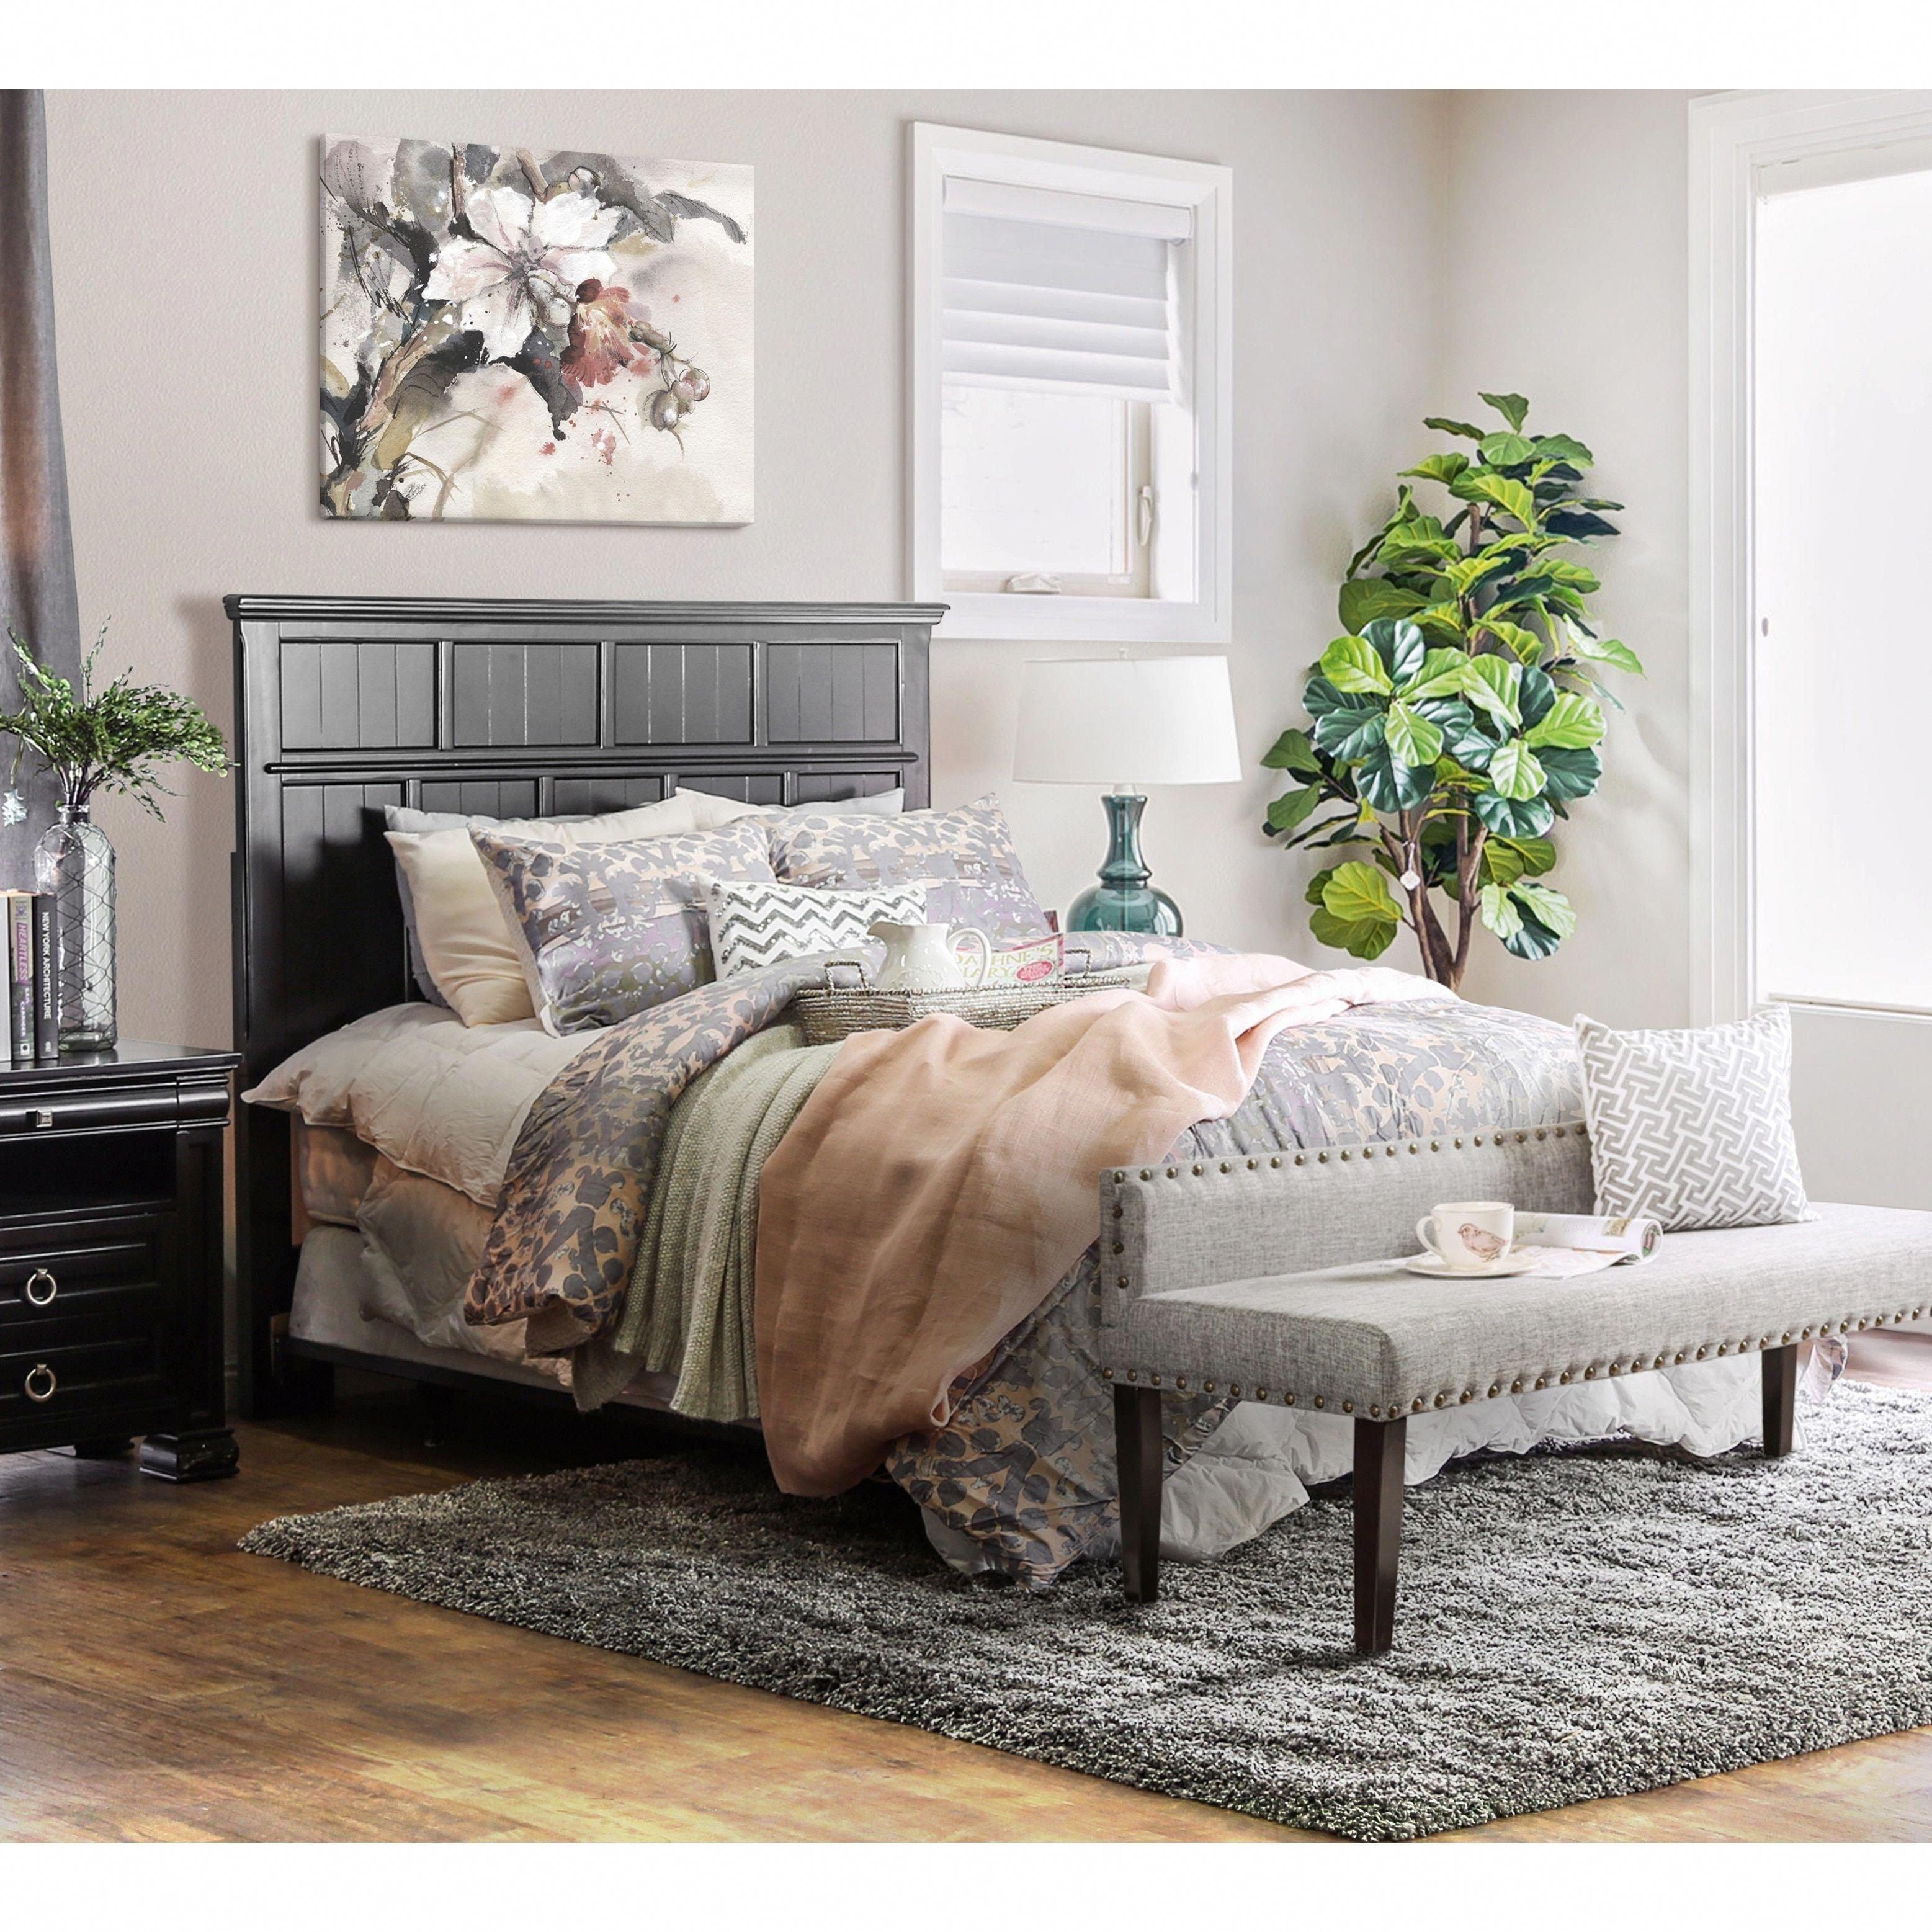 Cottage Style Bedroom Set Elegant Oliver & James Maruja Cottage Style Full Queen Headboard